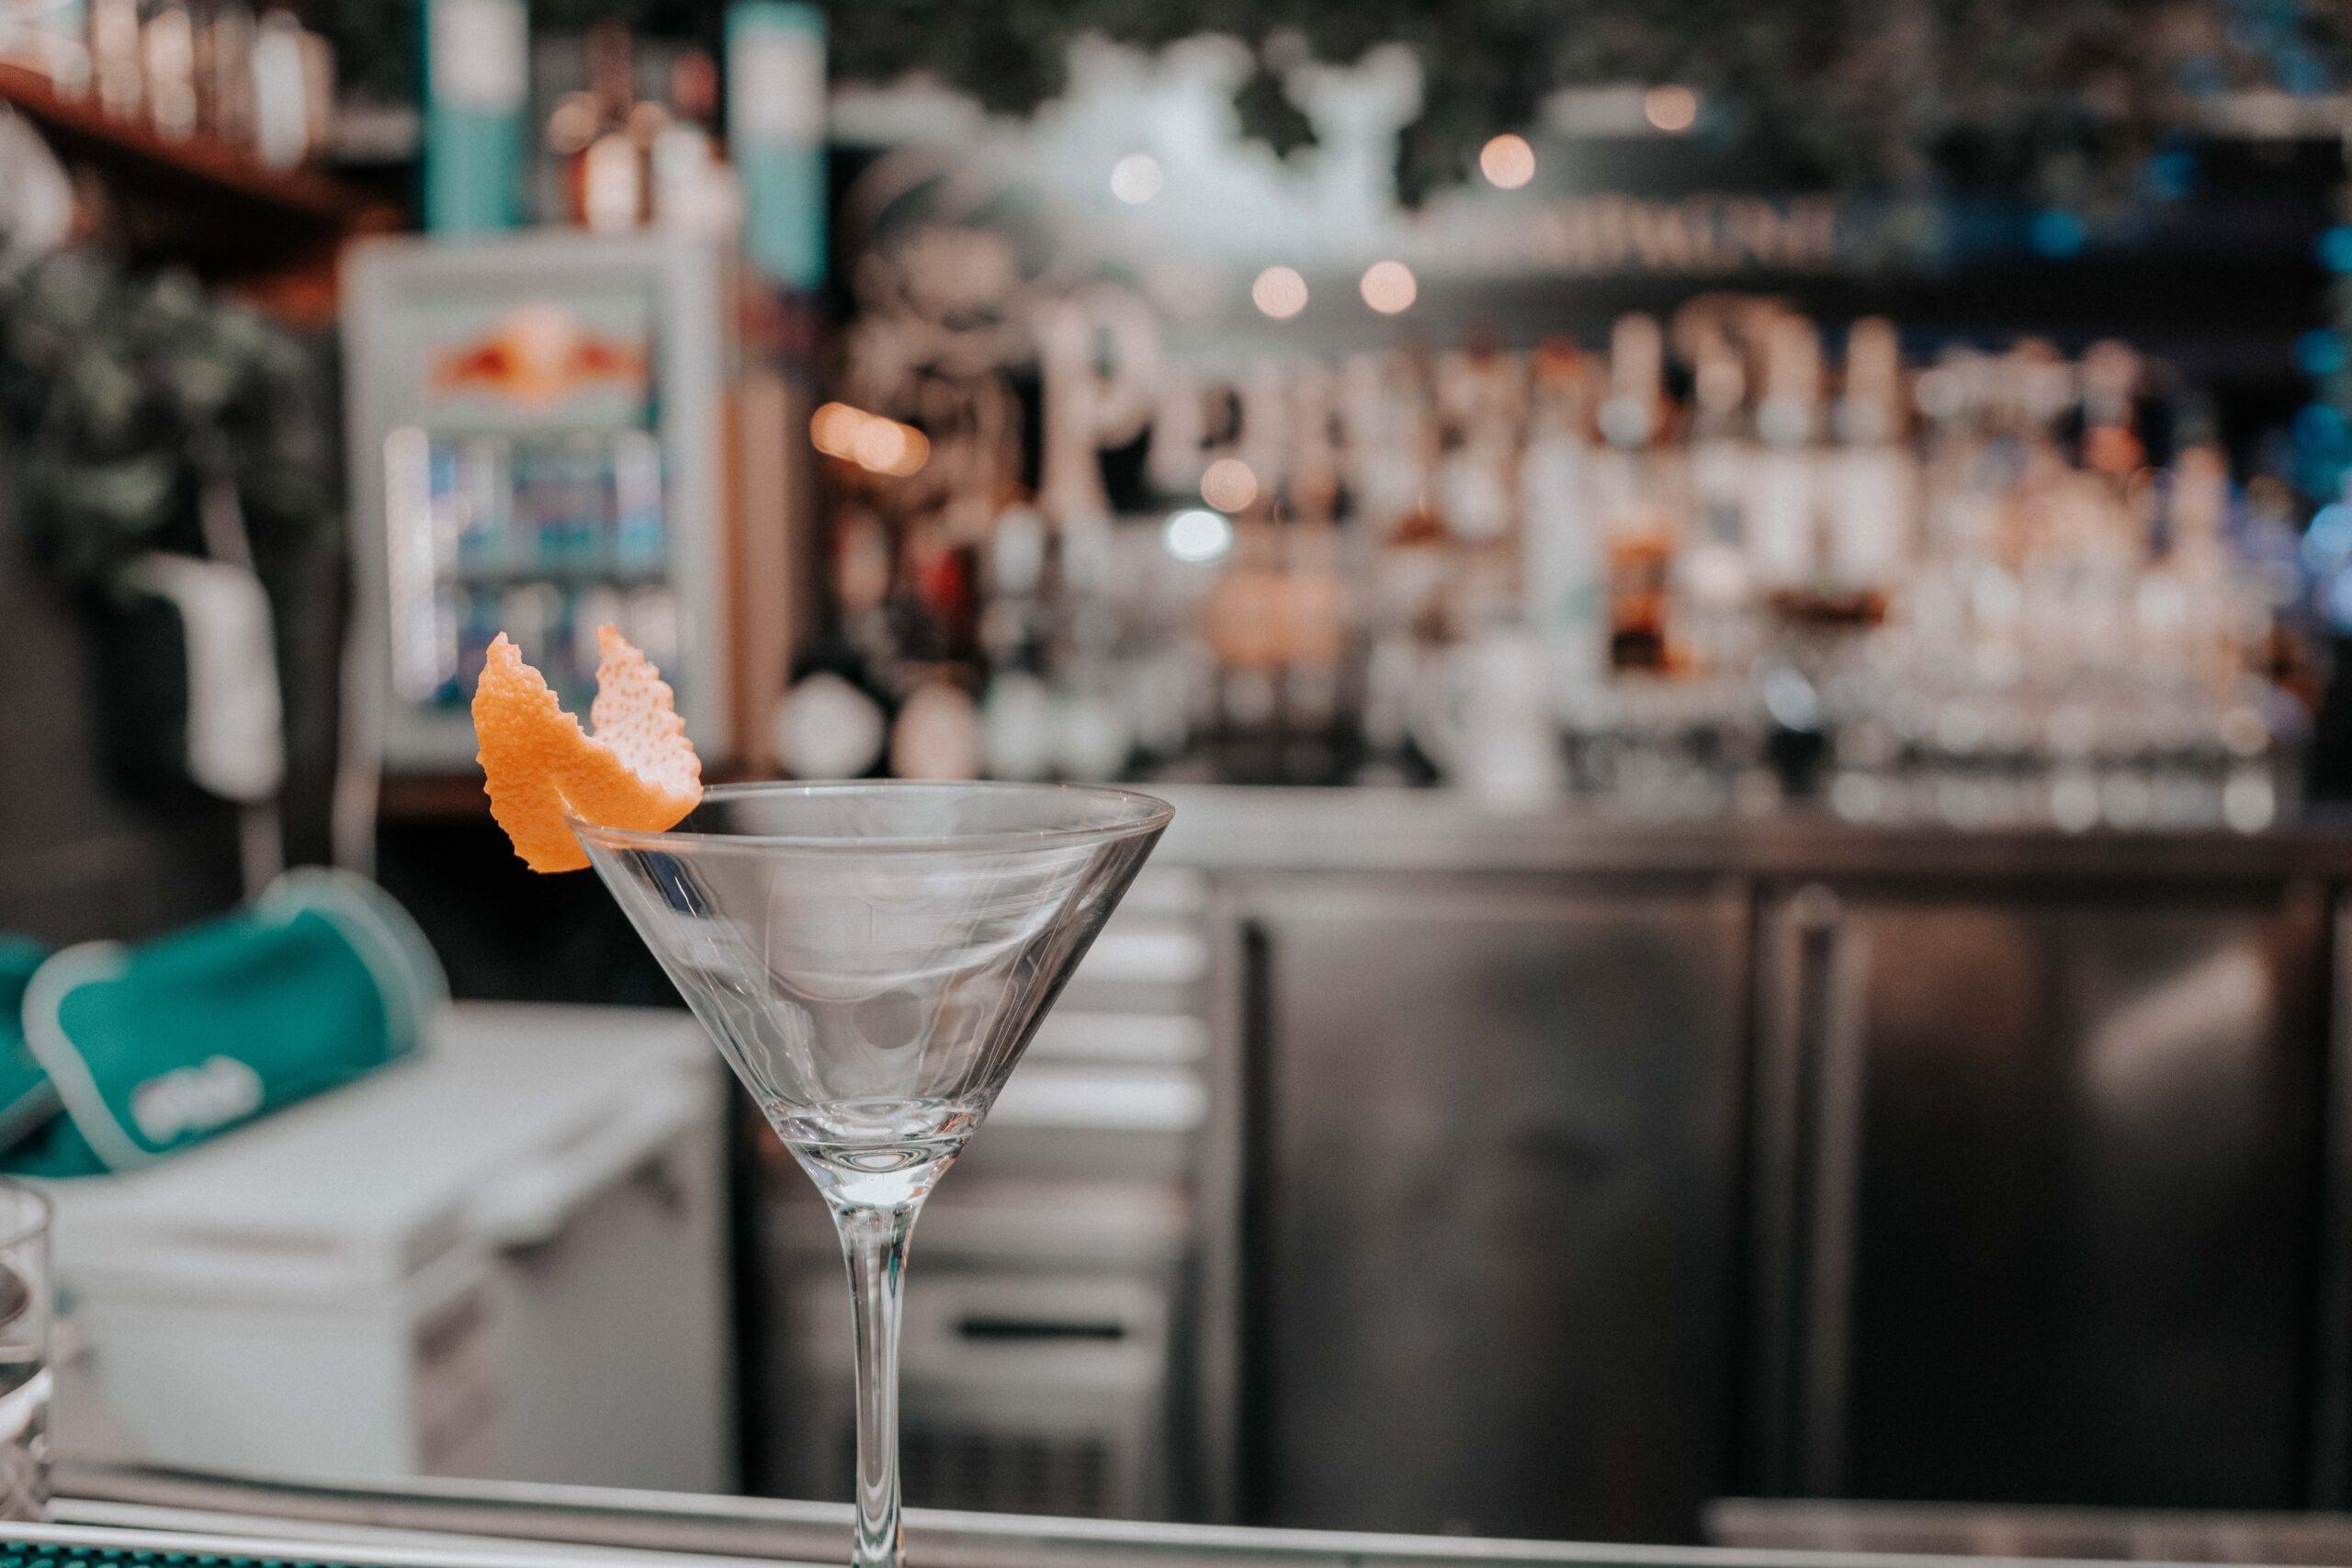 Lauren Windle Journalist The Alcohol Harm Paradox